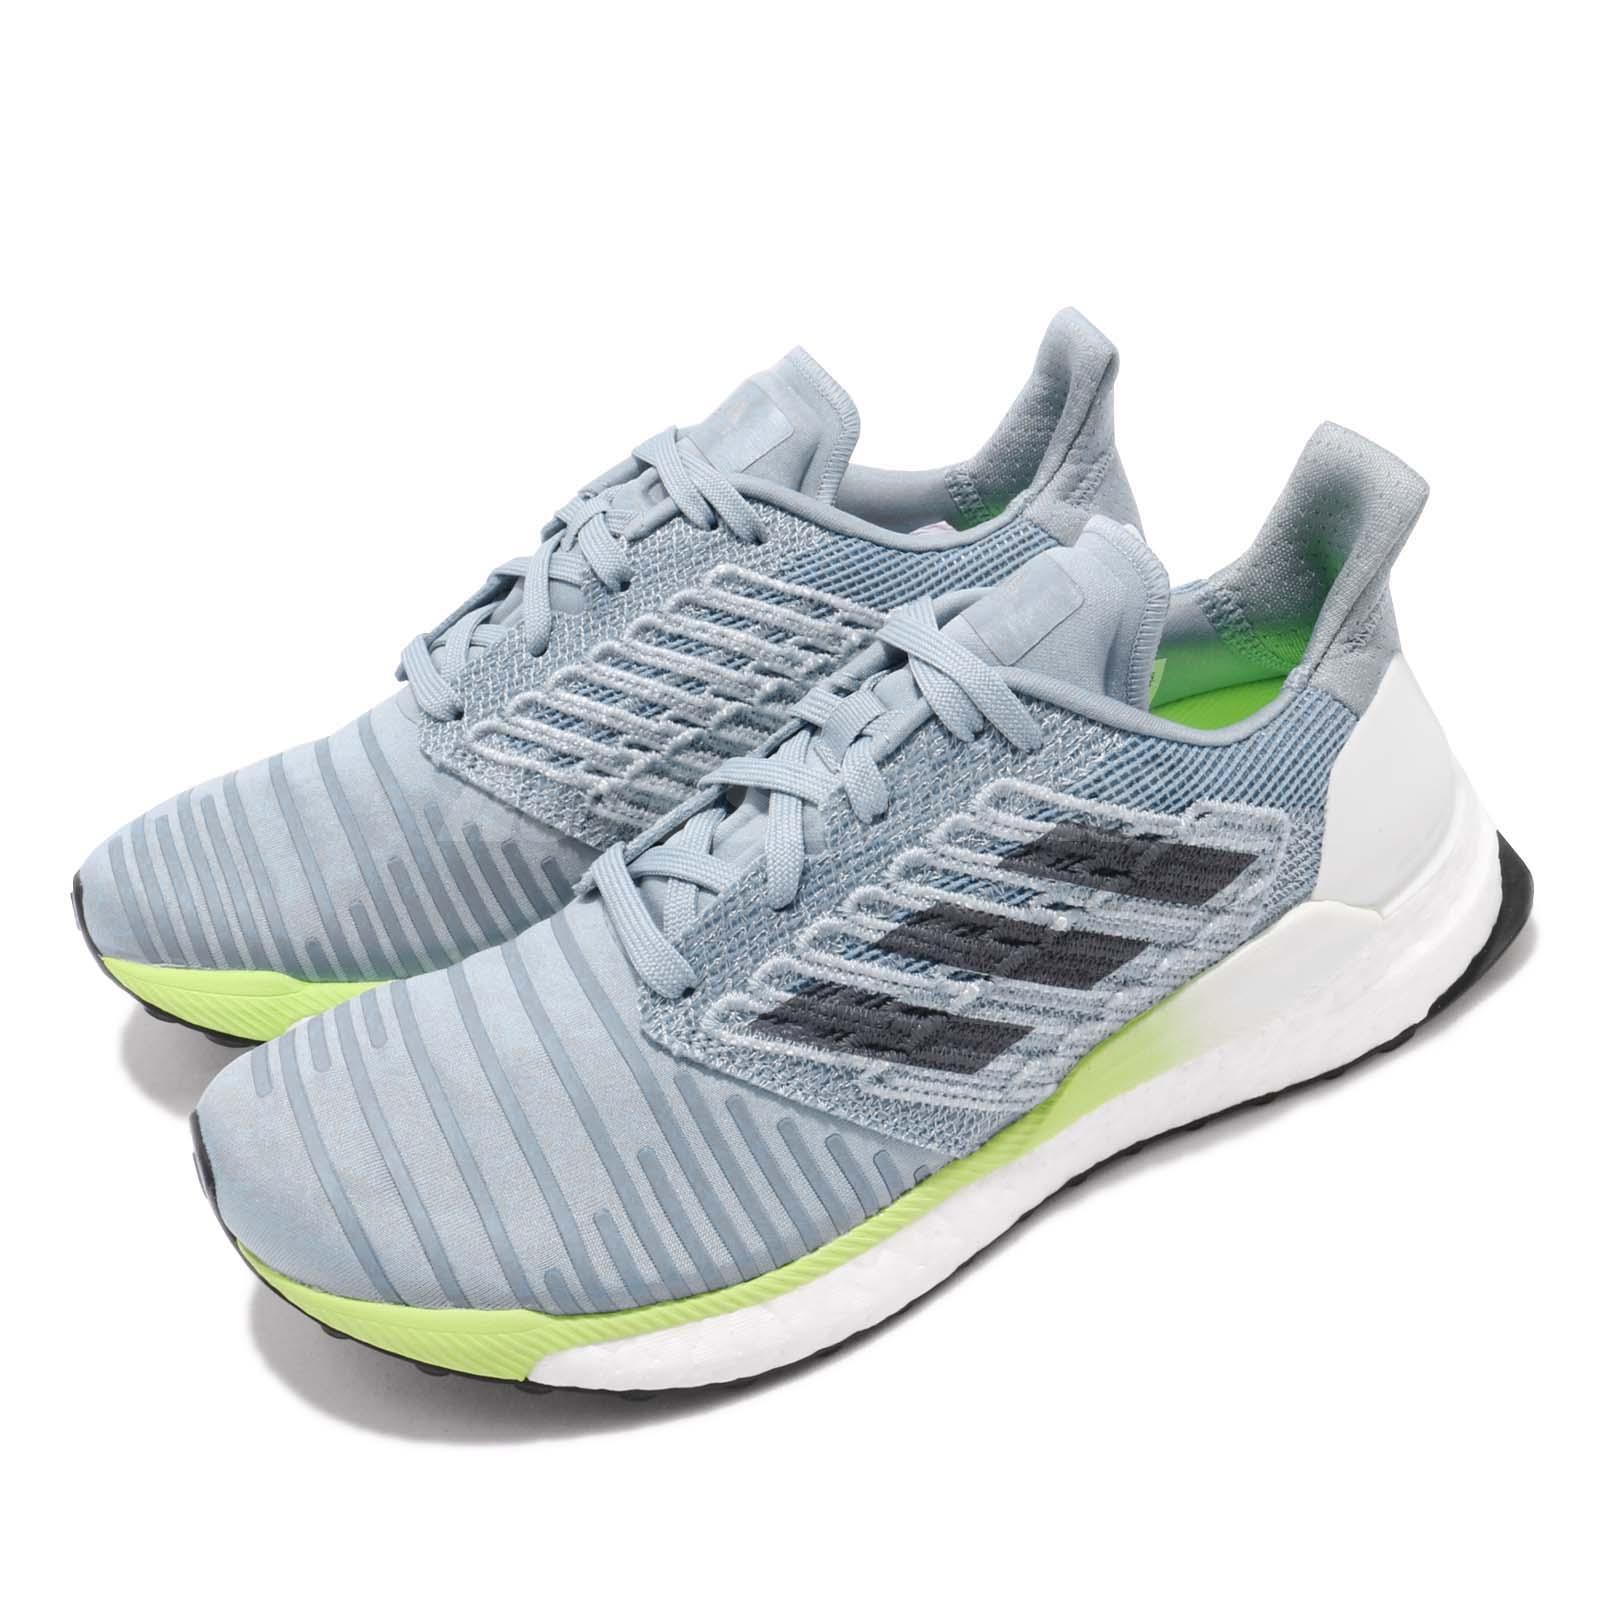 huge discount d0b1f f7b9a Details about adidas Solar BOOST W Grey Onix Blue Hi-Res Yellow Women  Running Shoes B96285